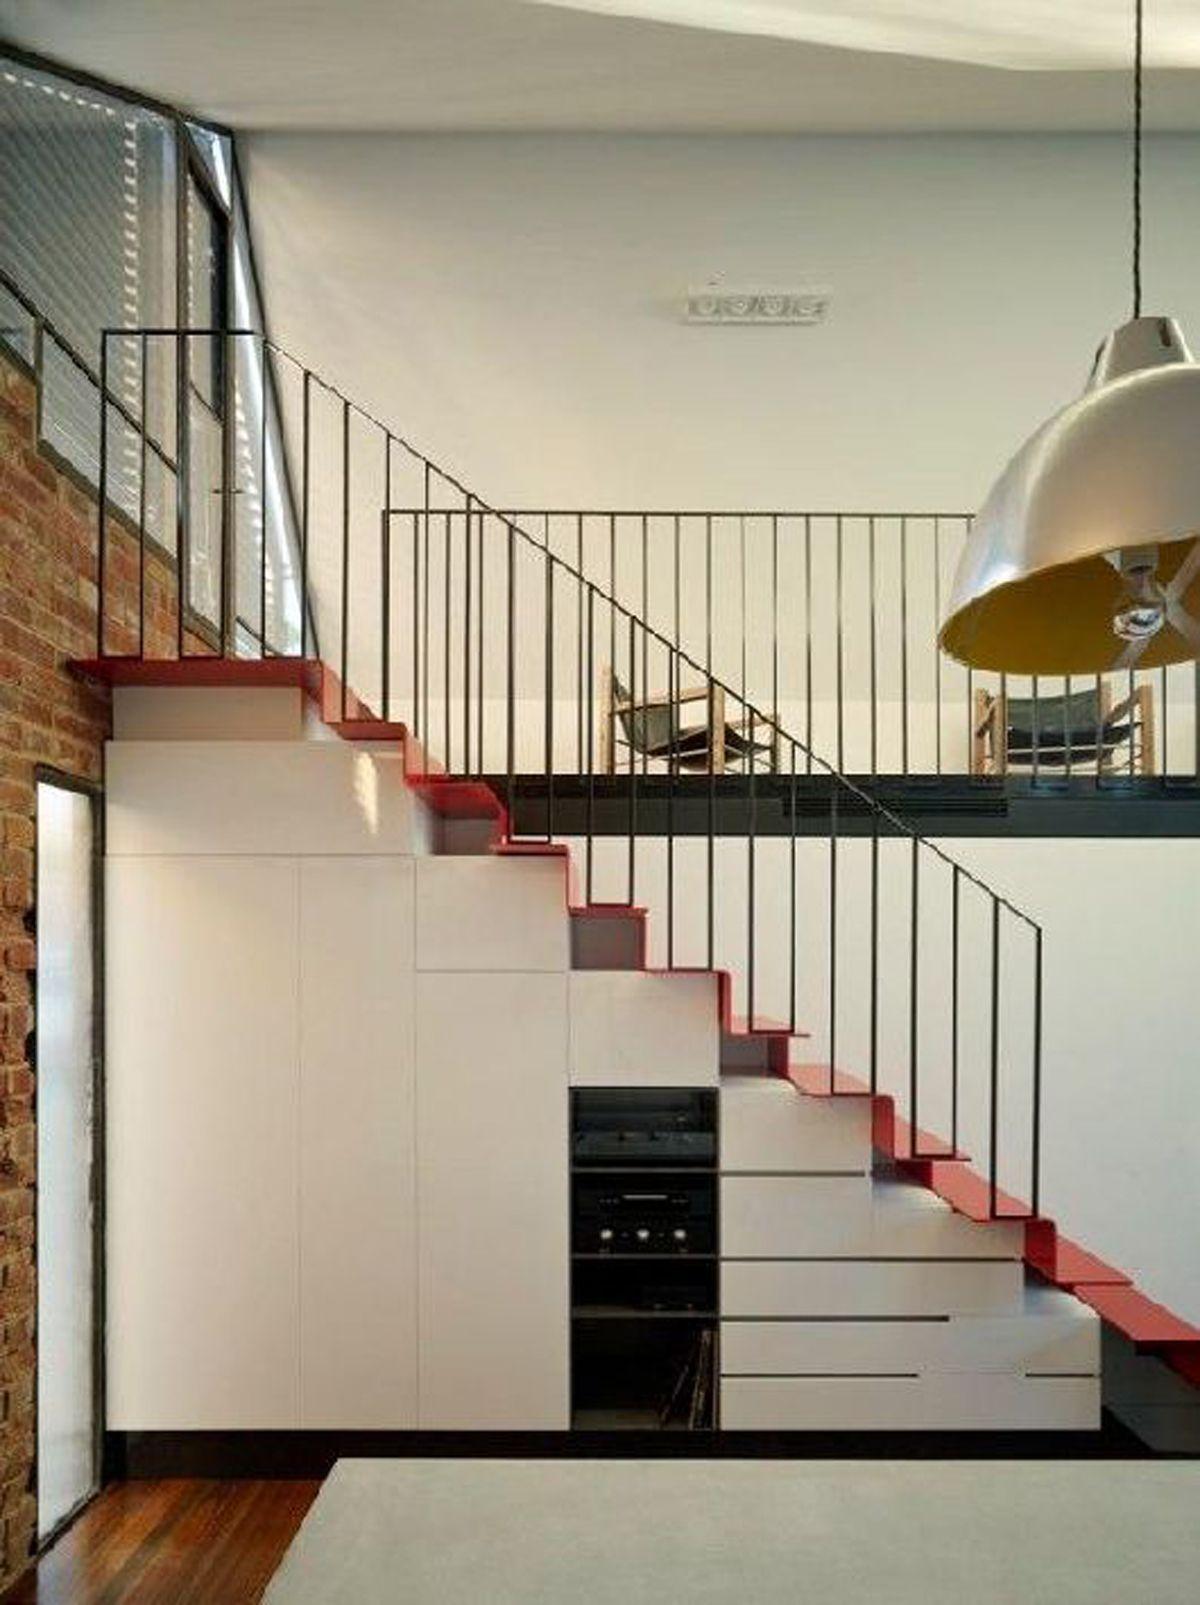 Best Duplex Stairs Design Google 검색 계단 디자인 집 내부 집 디자인 640 x 480